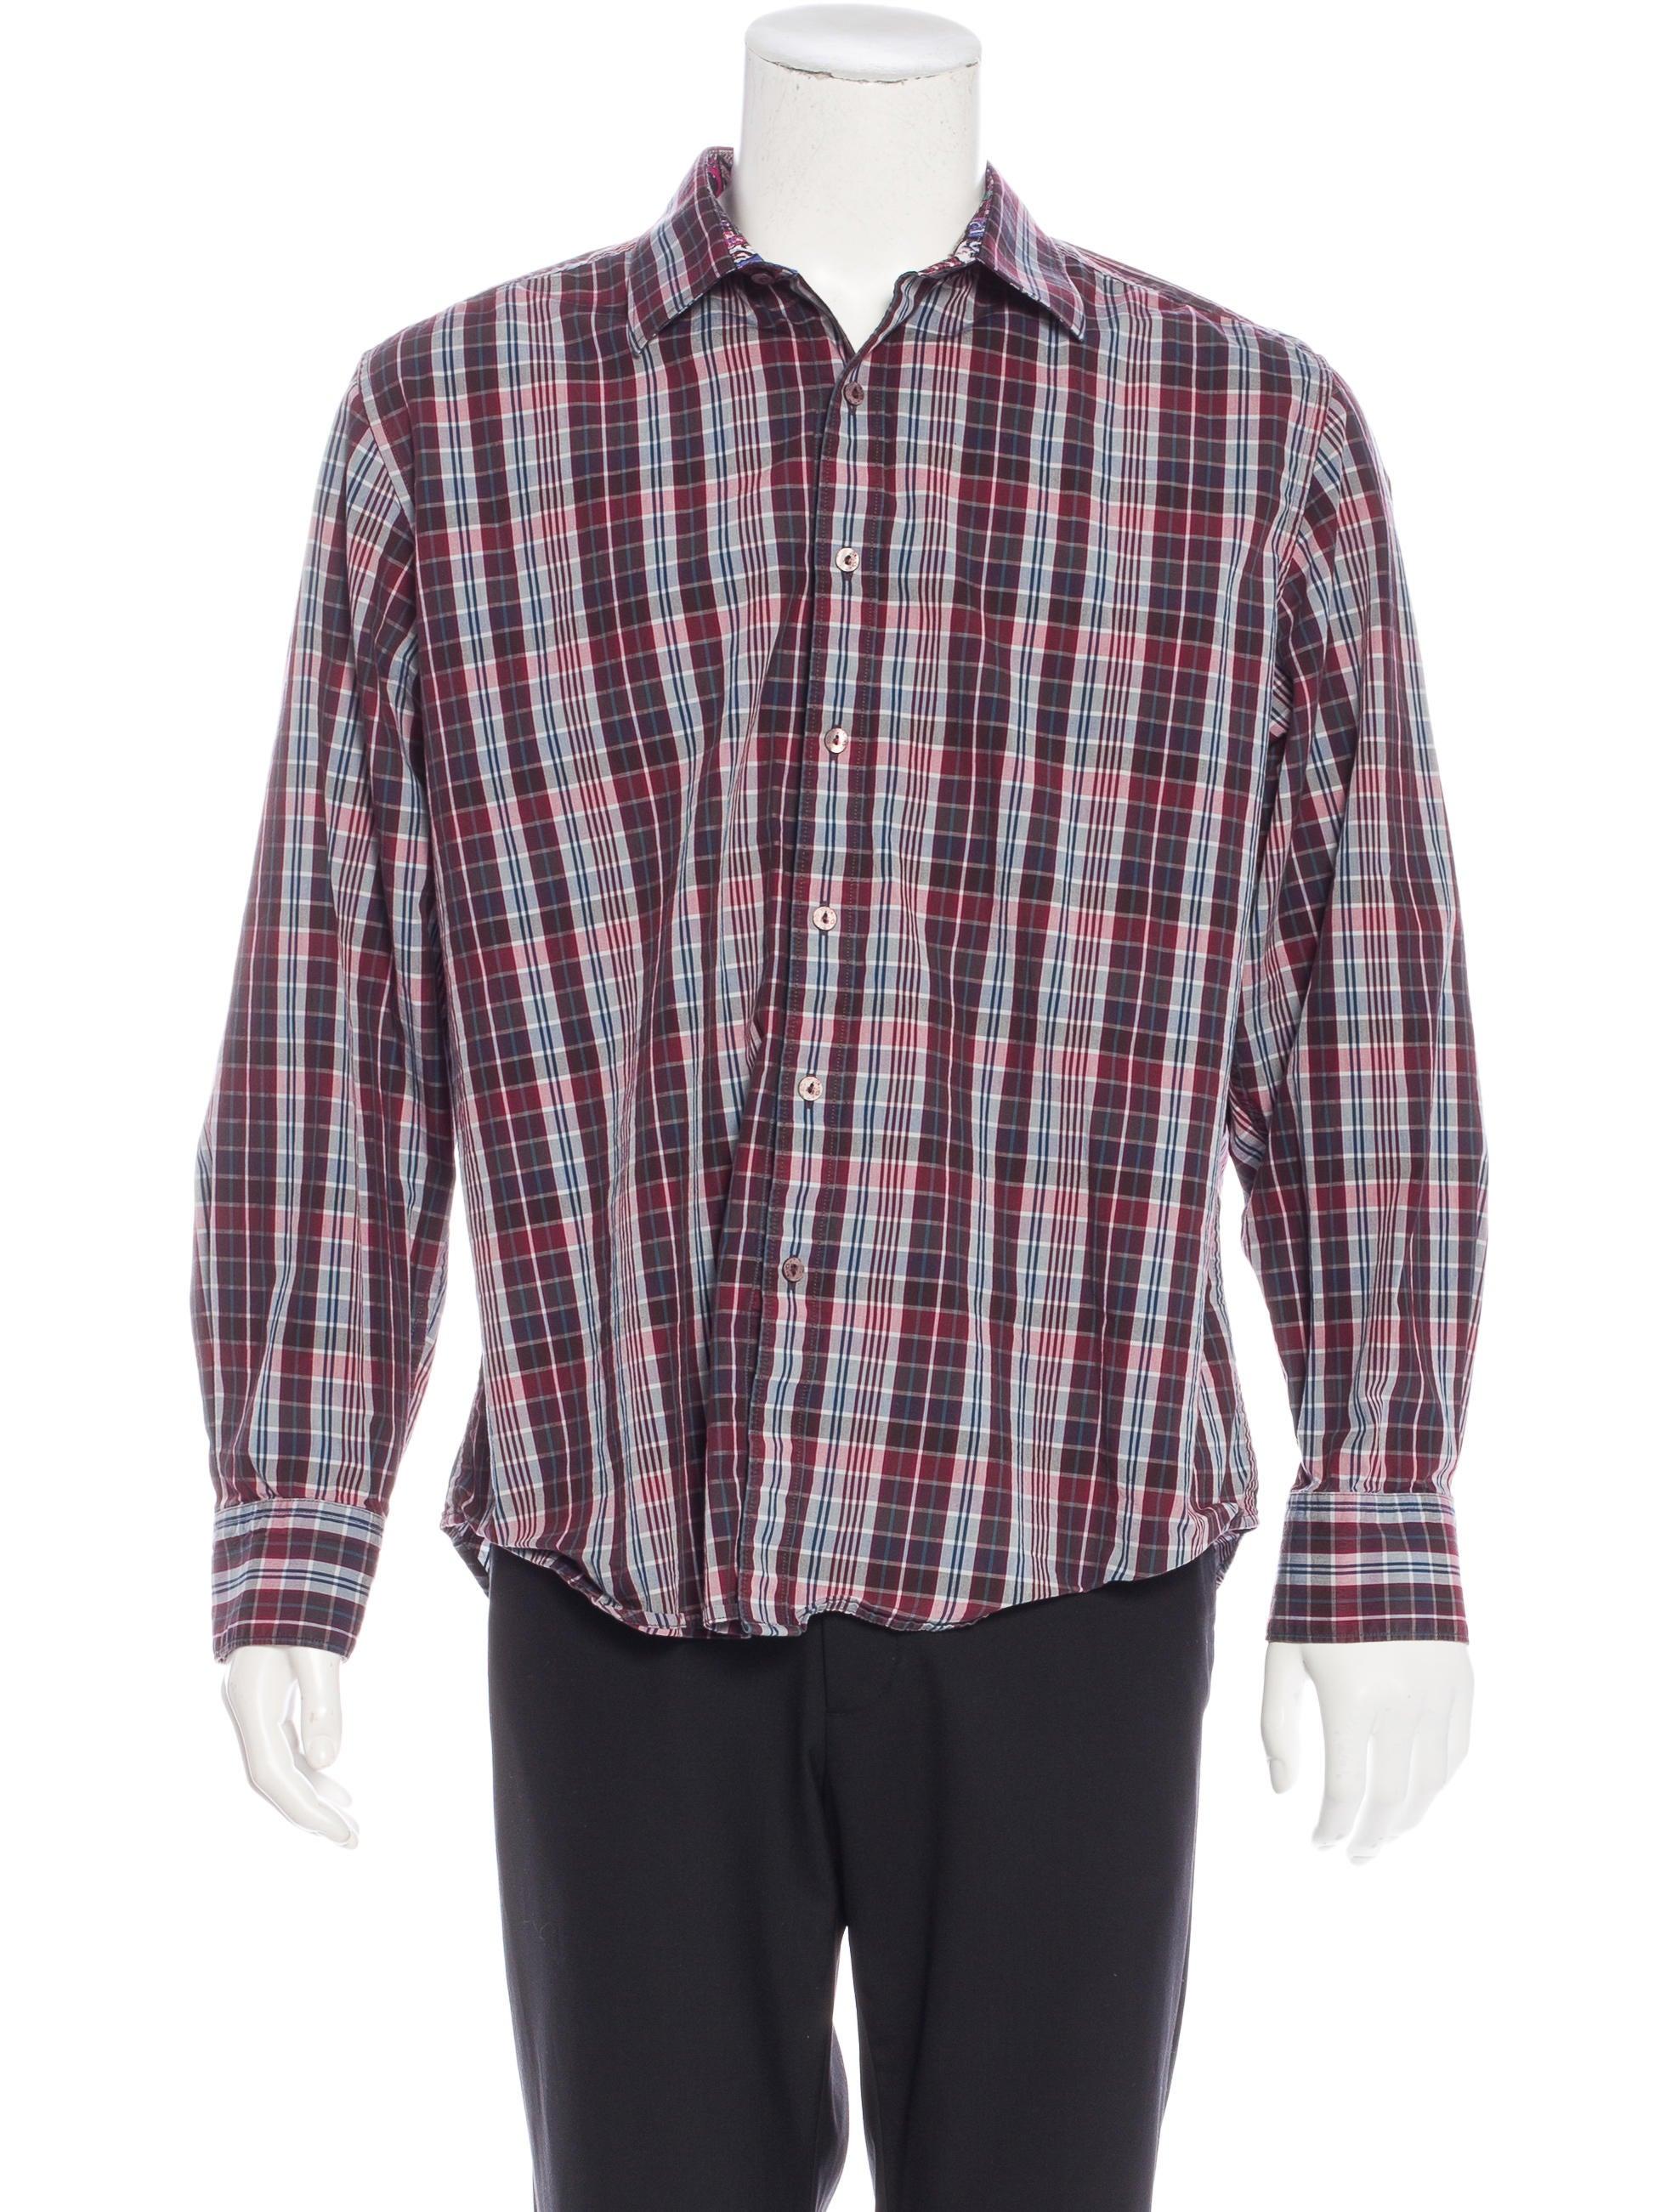 Robert Graham Classic Fit Plaid Shirt Clothing Wrobg20915 The Realreal